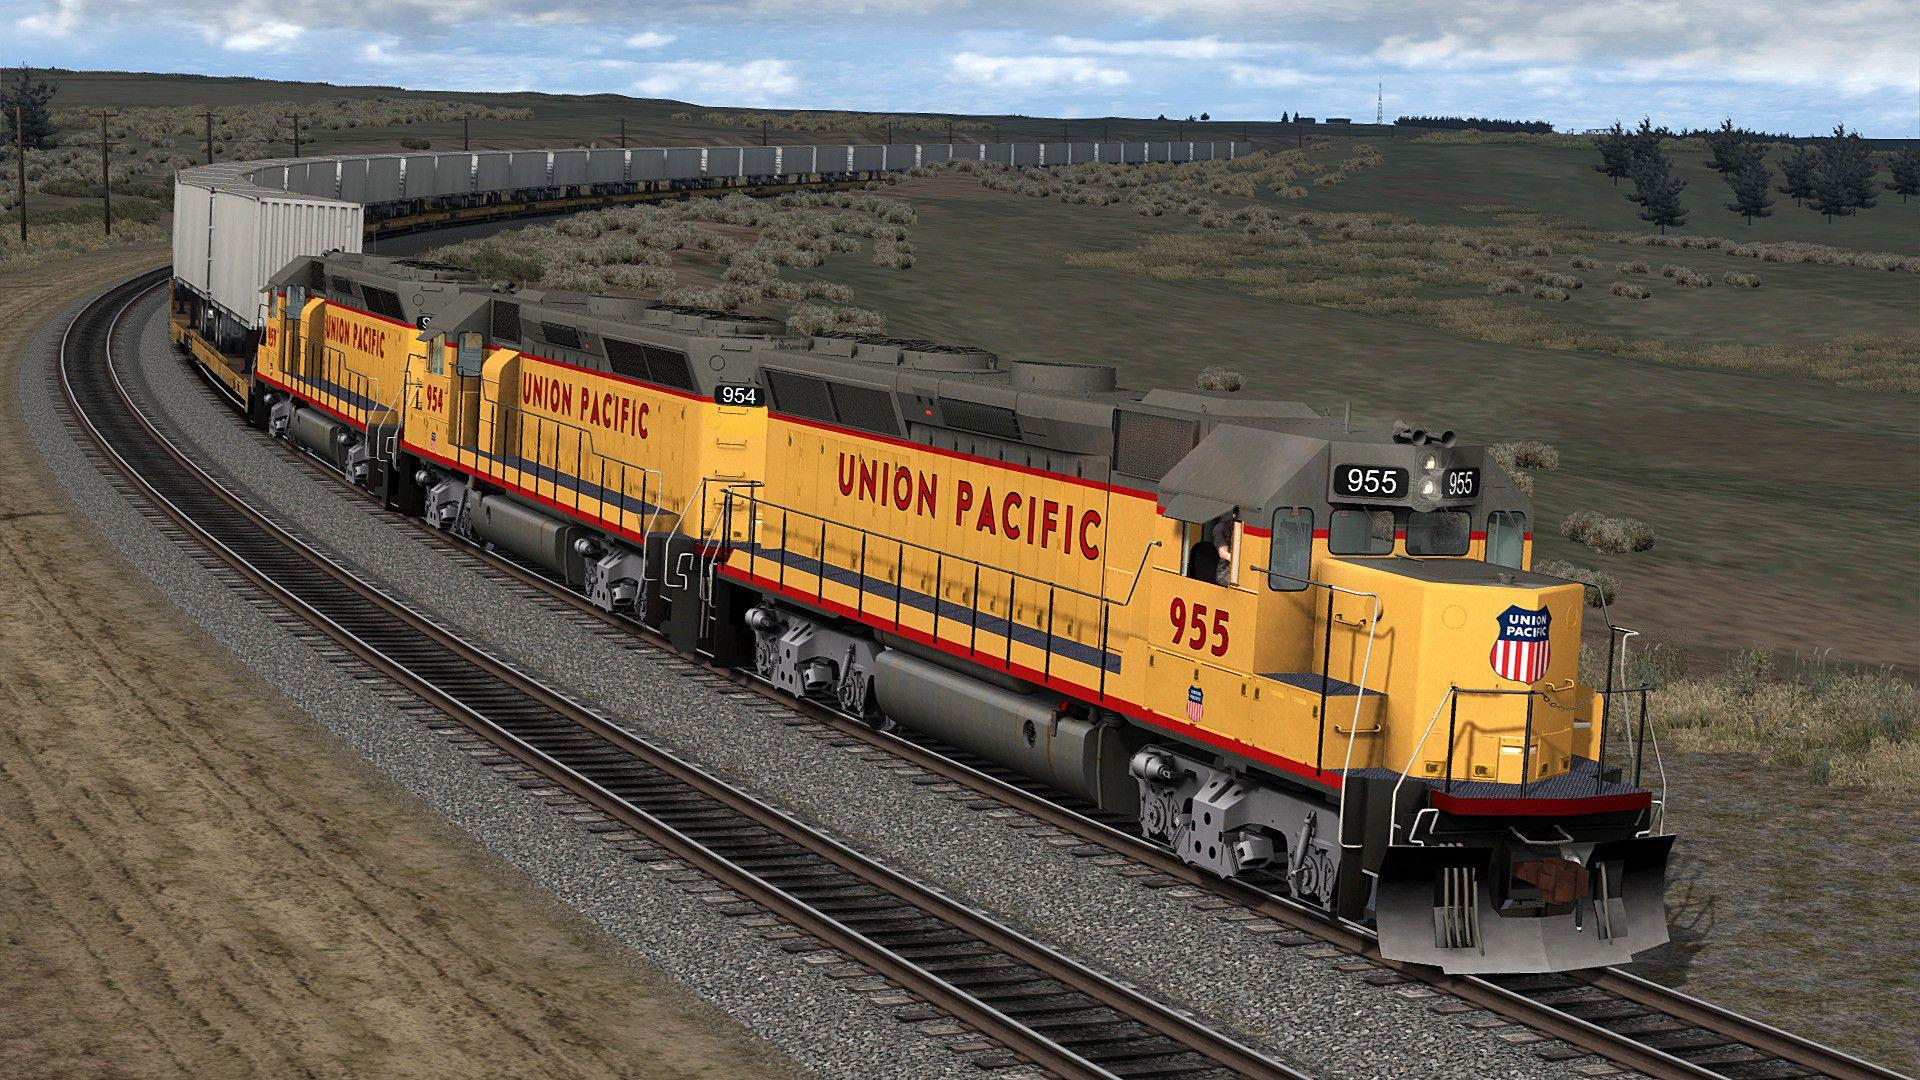 UPGP40X6